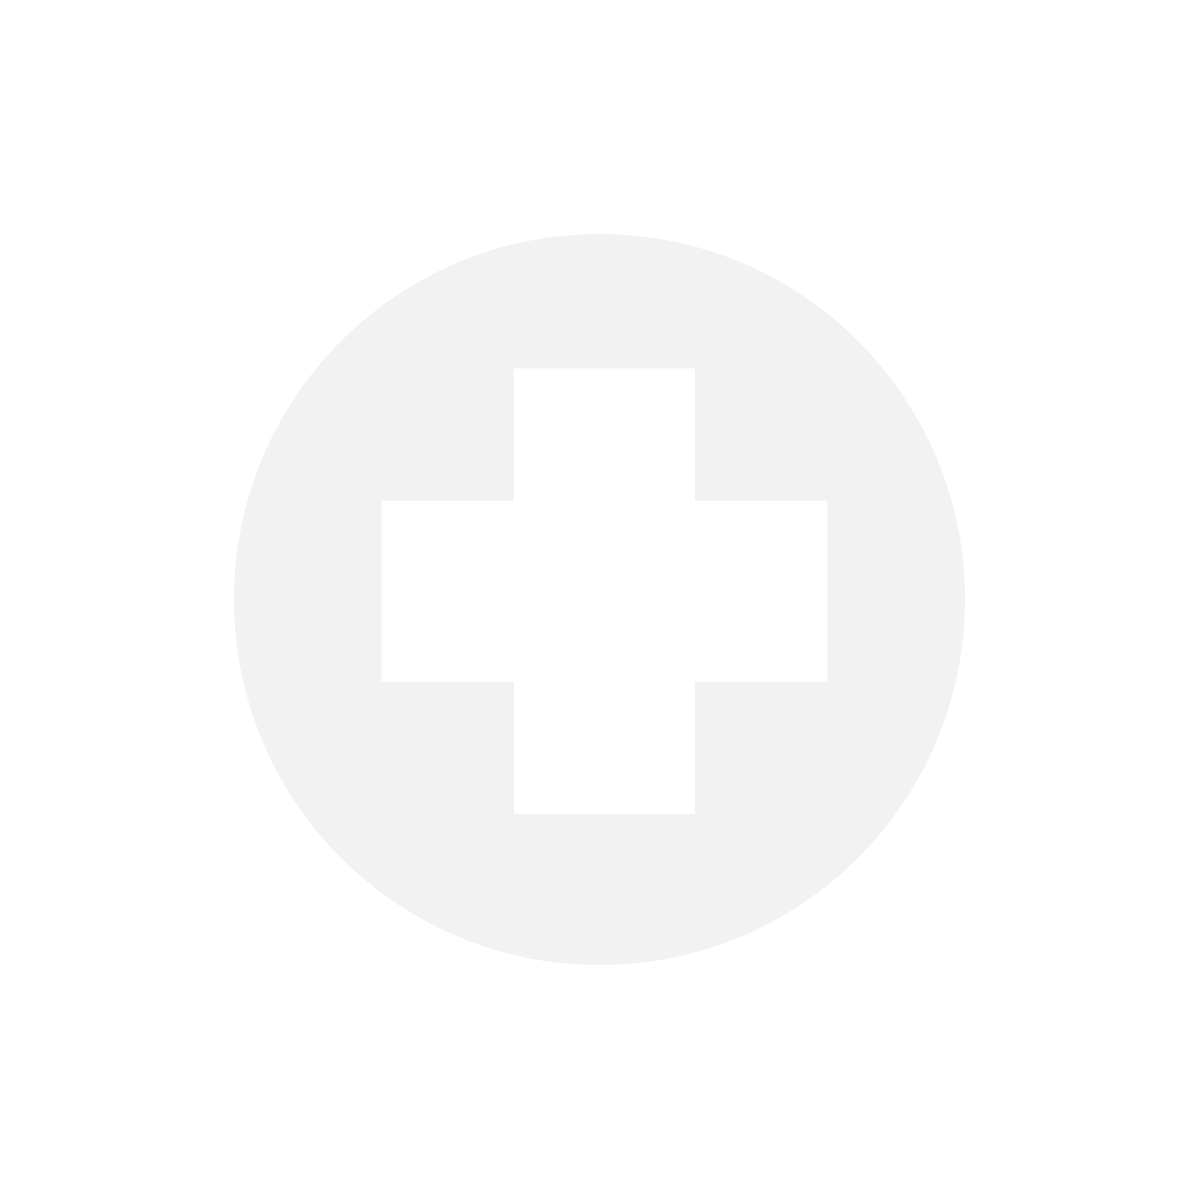 Découvrez la Cryolipolise Z Lipo avec Sylvain Maton, Zimmer